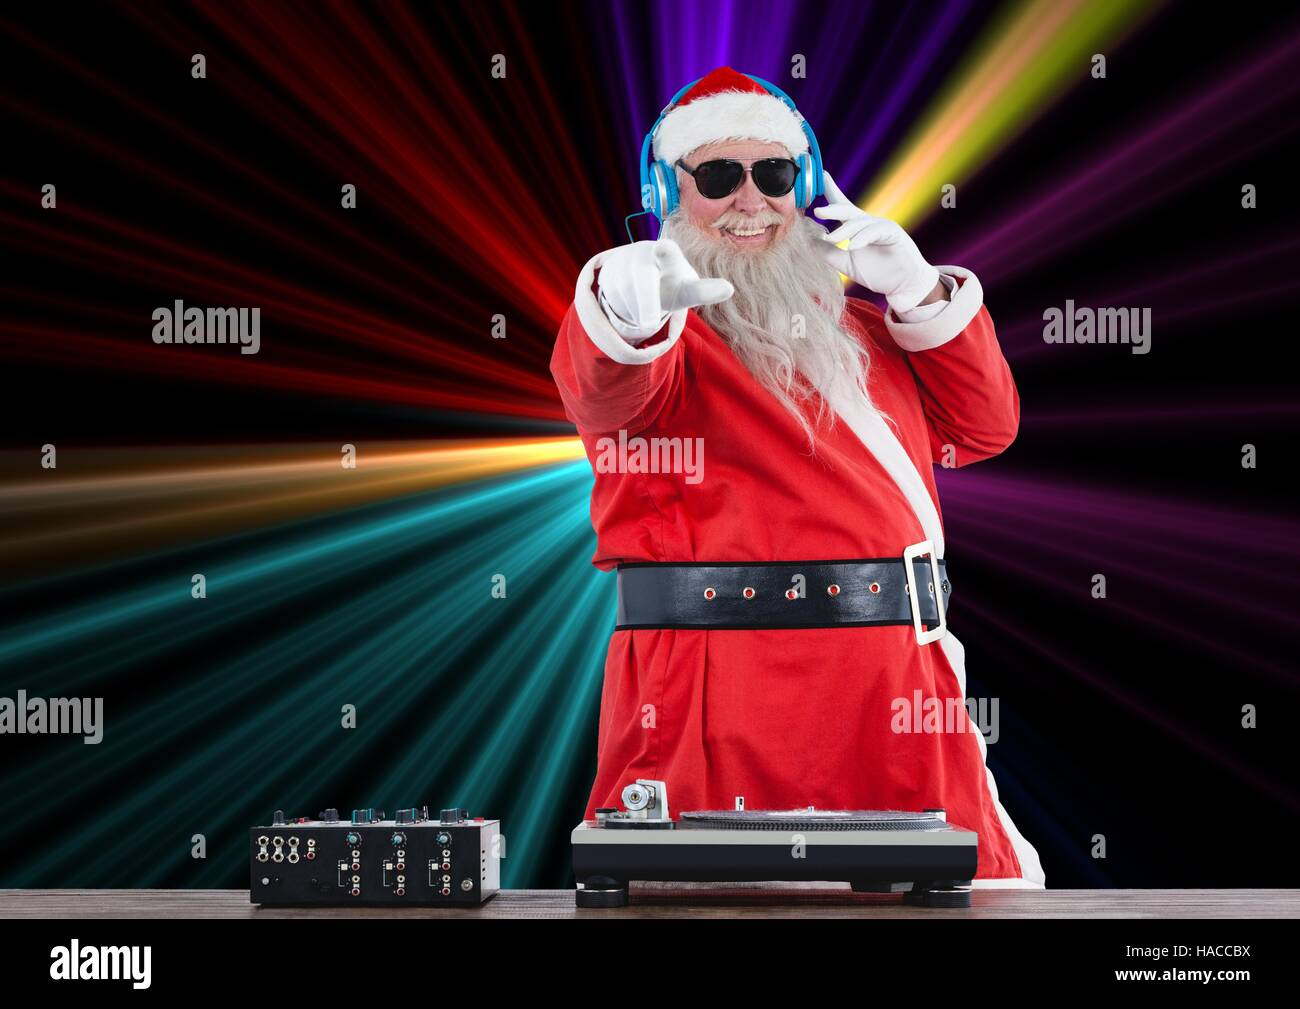 Dj santa claus mixing up some Christmas cheer - Stock Image